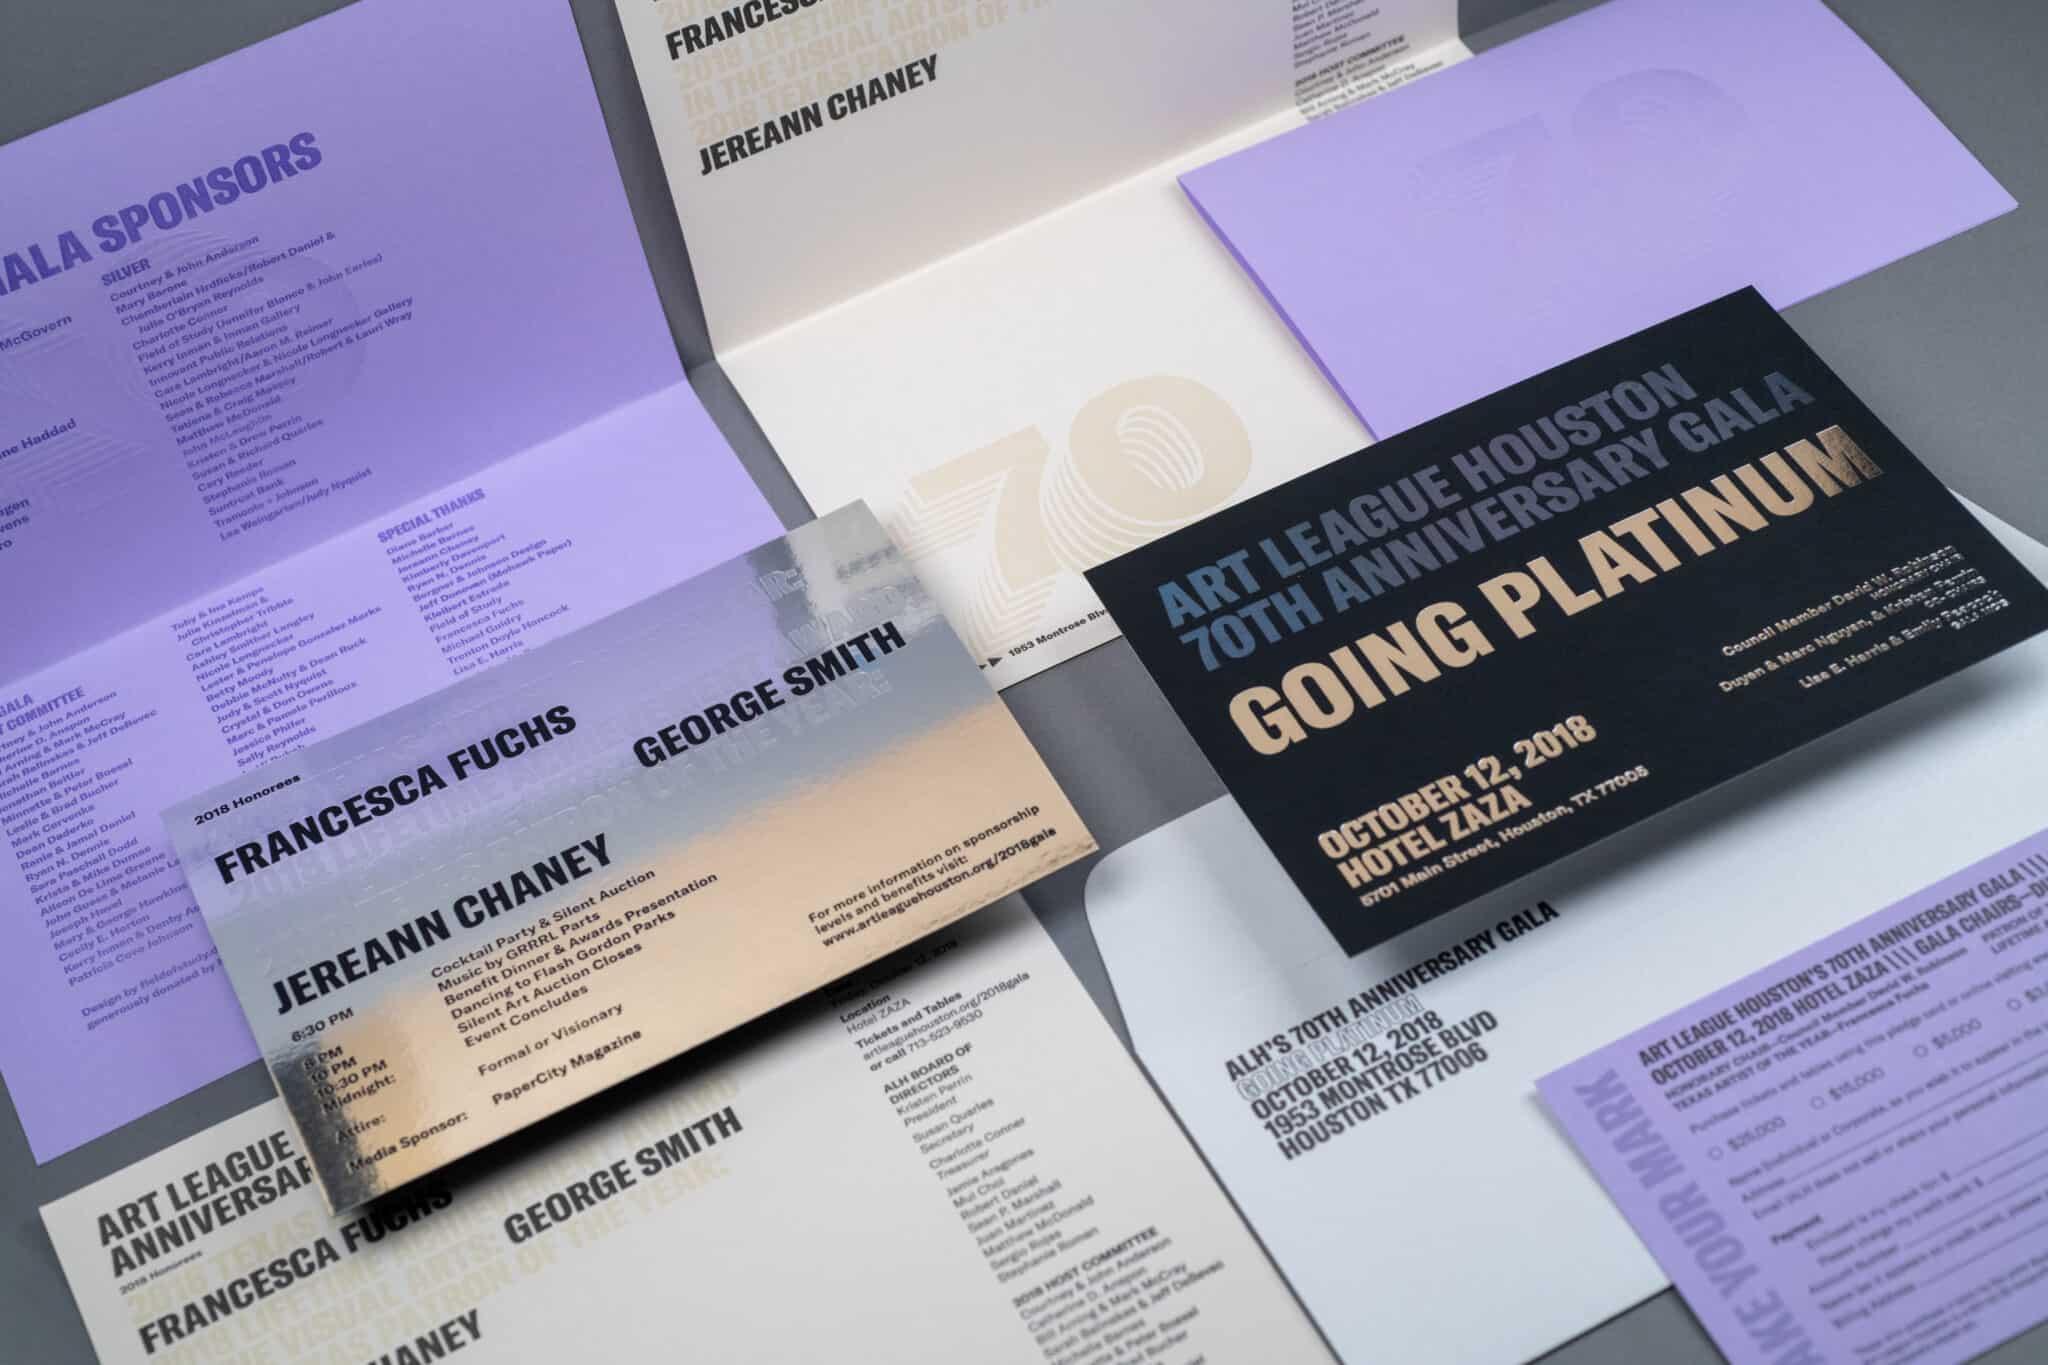 Art League Houston Going Platinum gala